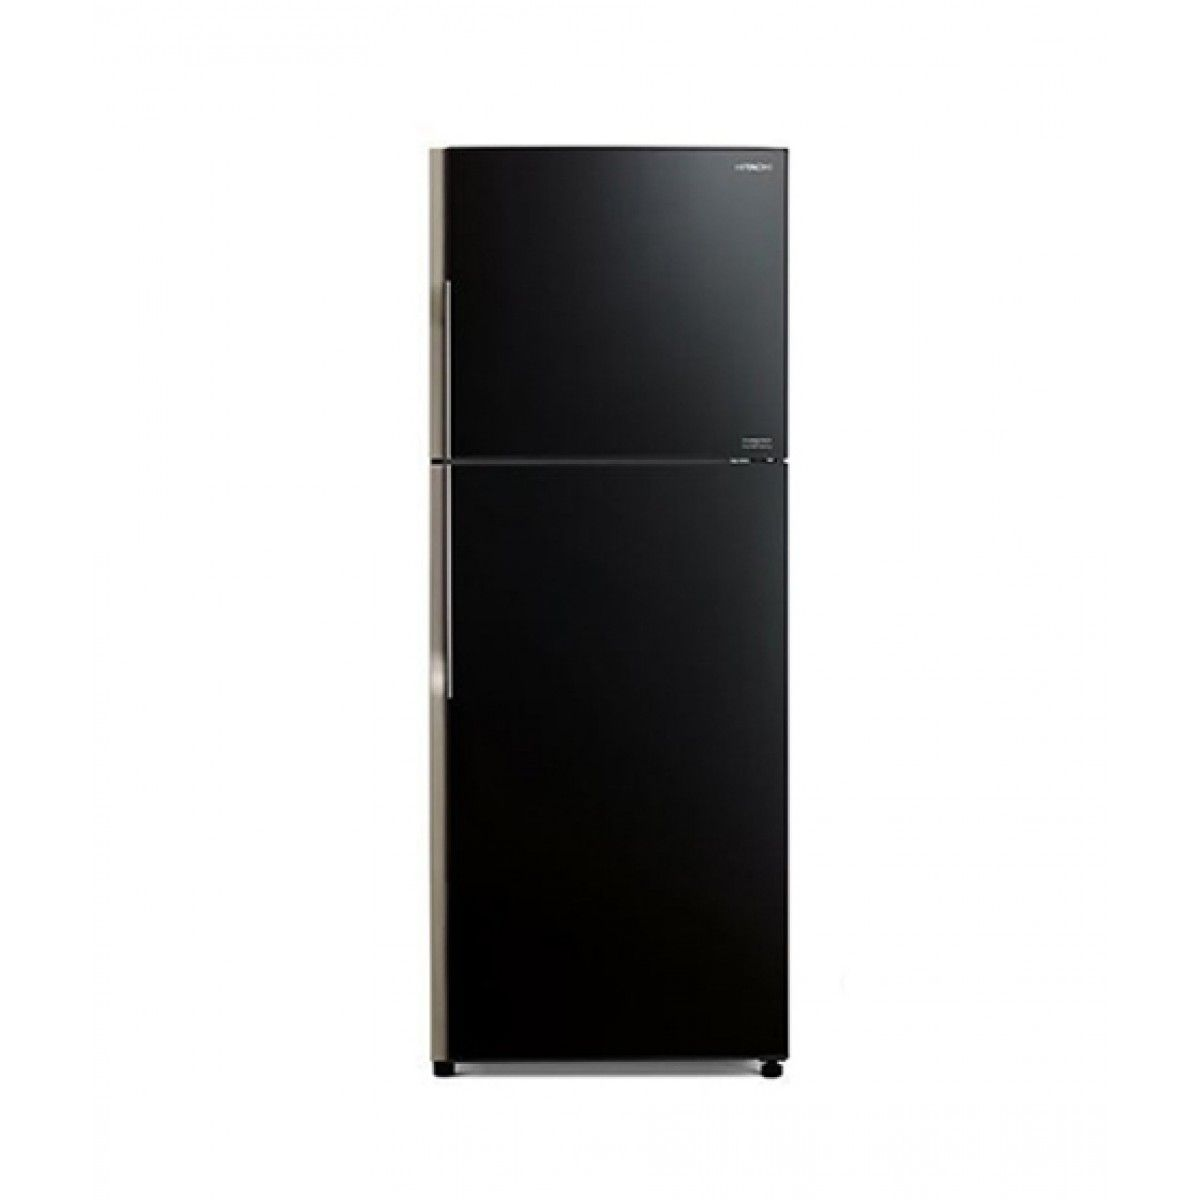 Hitachi (R-VG460P3PB) Freezer-on-Top 15 cu ft Refrigerator Black